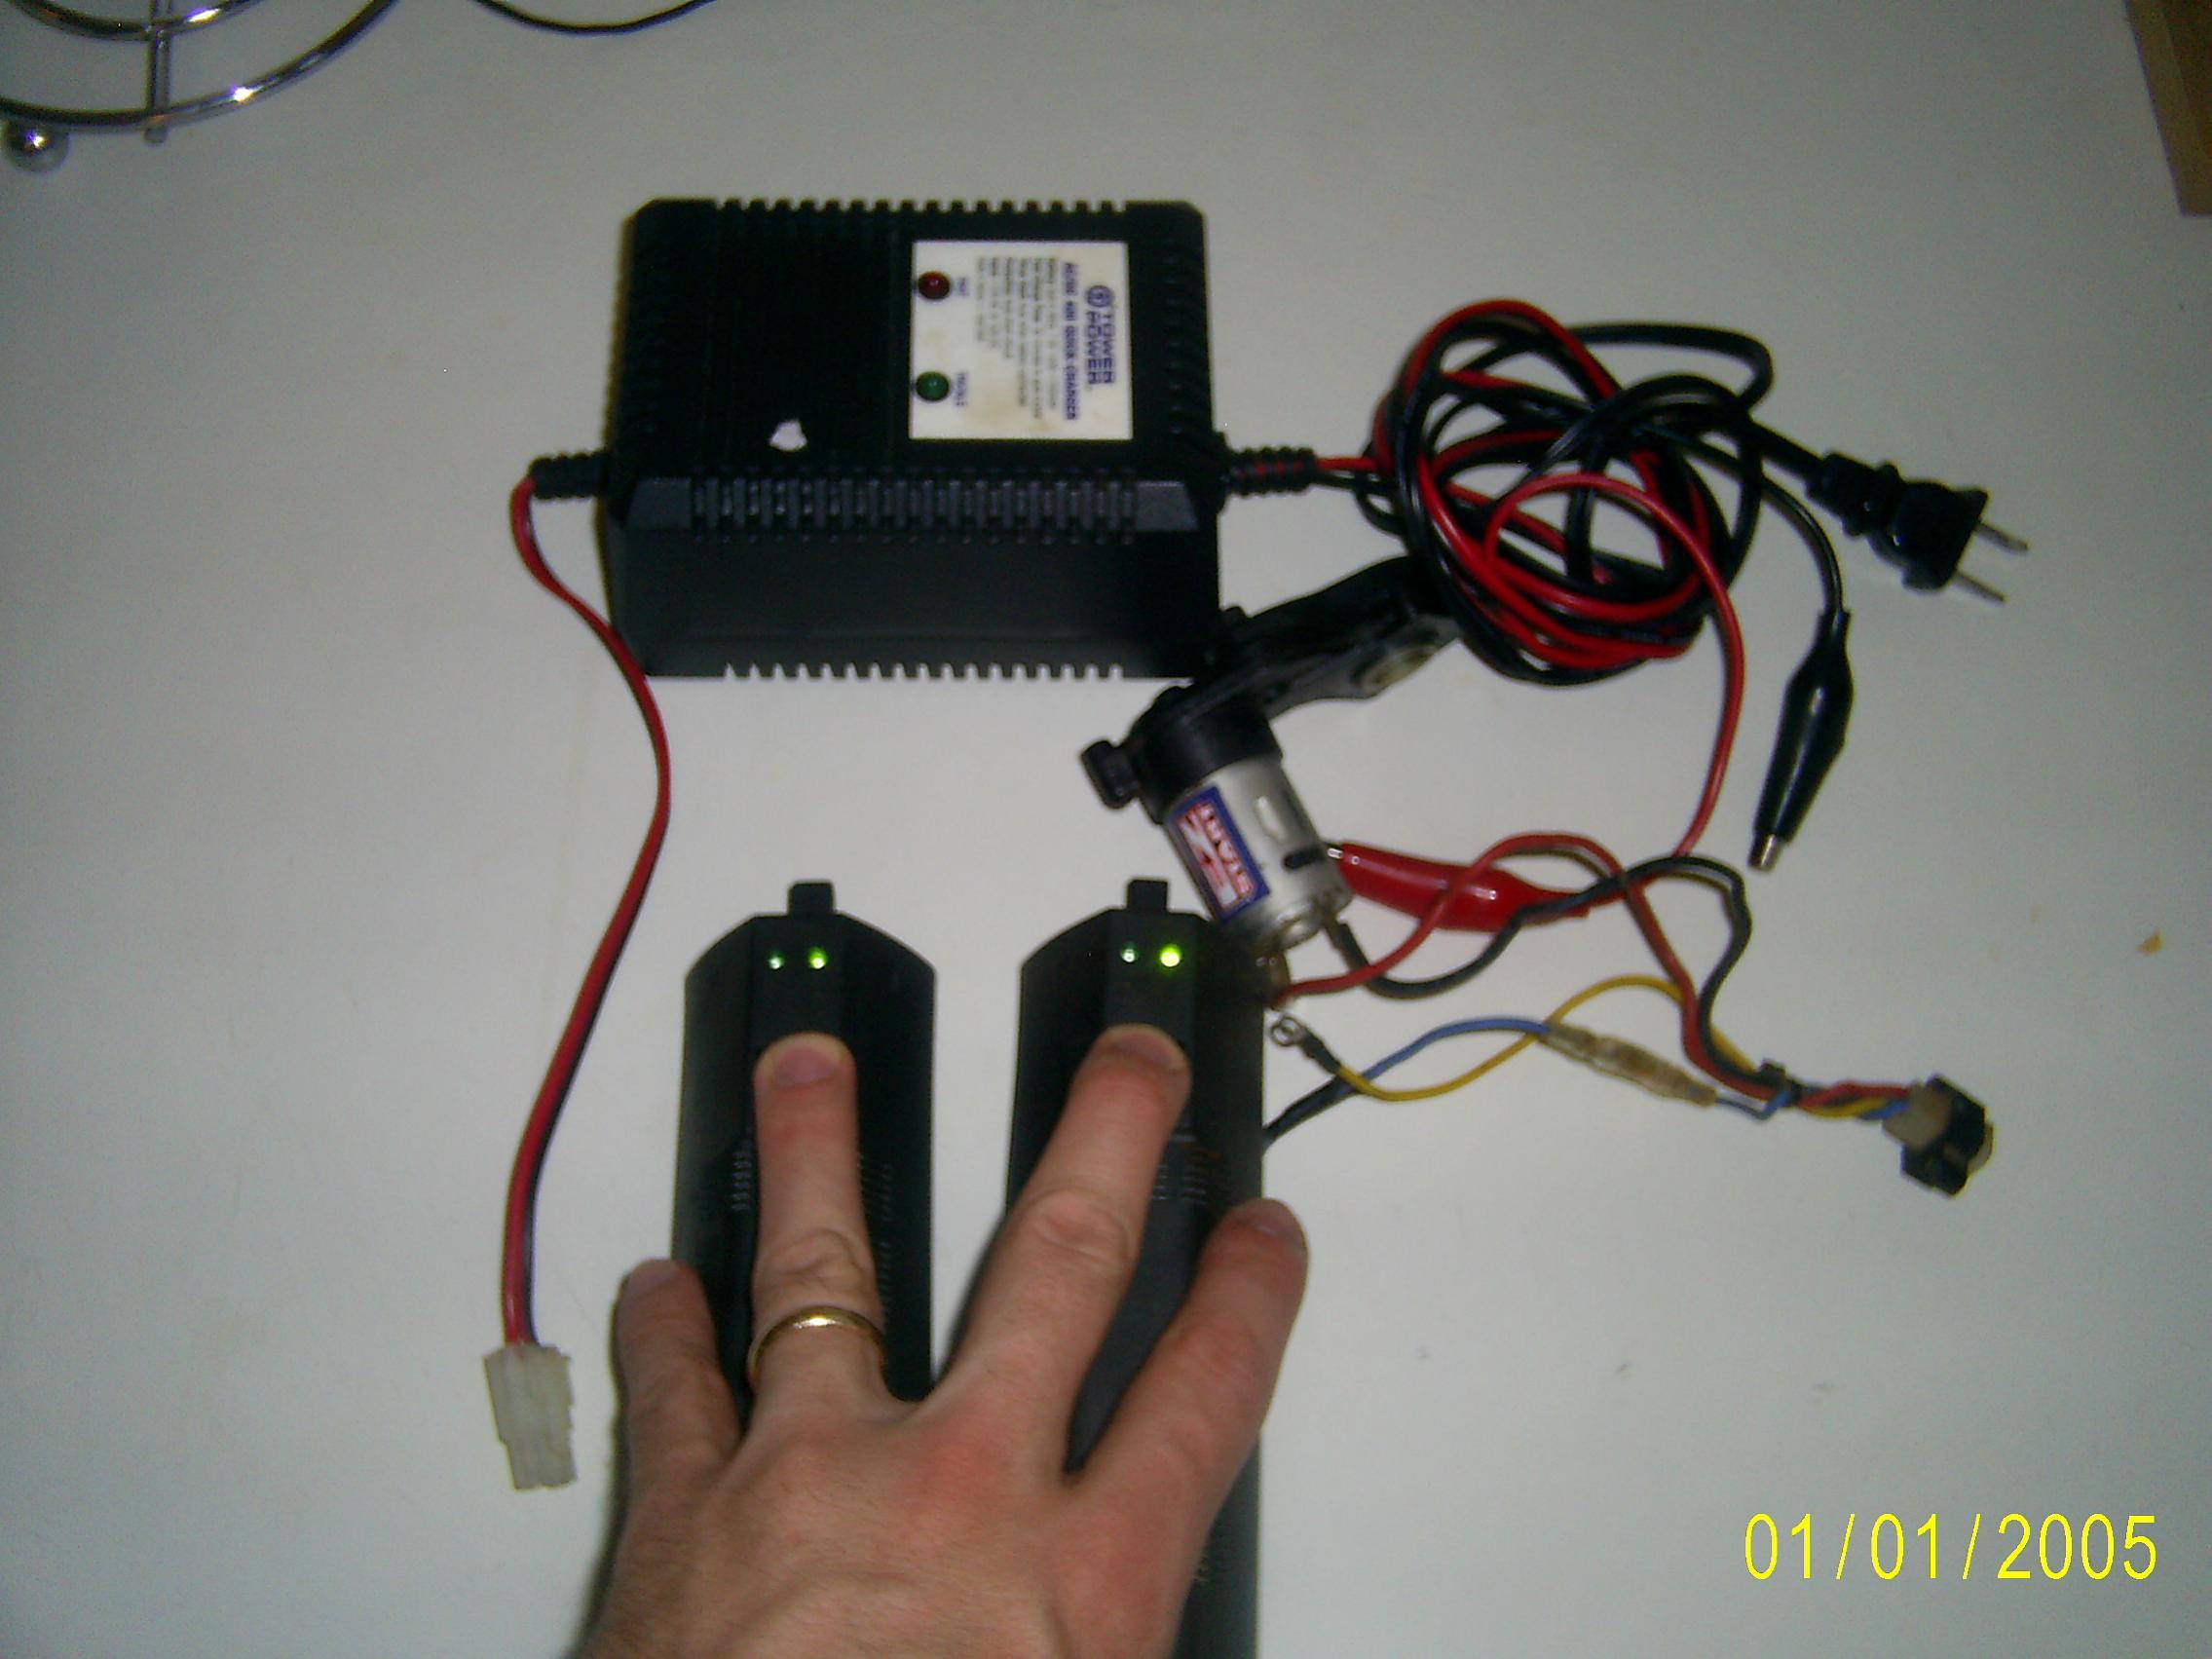 461953d1244334536 ez start2 full setup revo foc revo aluminum roll hoop s4020240 ez start 2 complete setup, revo foc traxxas ez start wiring harness at gsmx.co